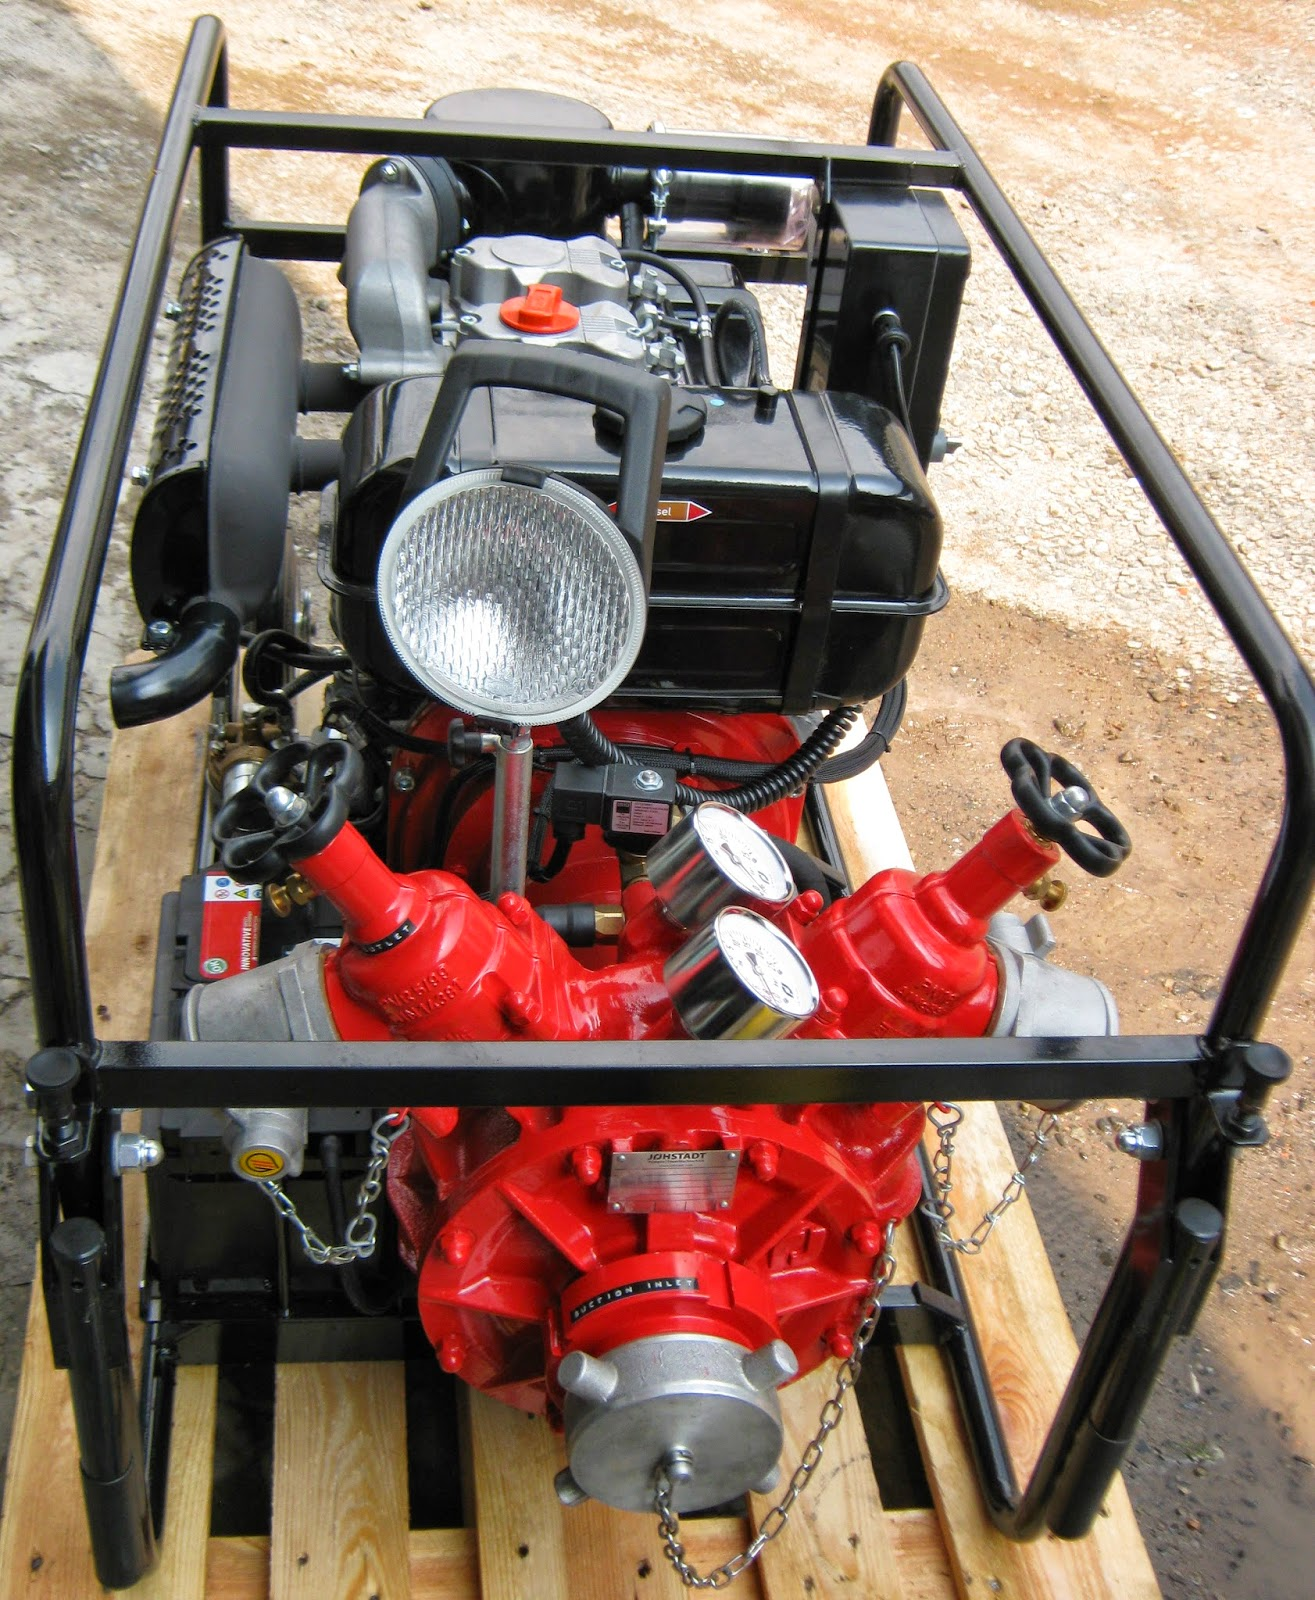 Centrifugal pump instruction manual